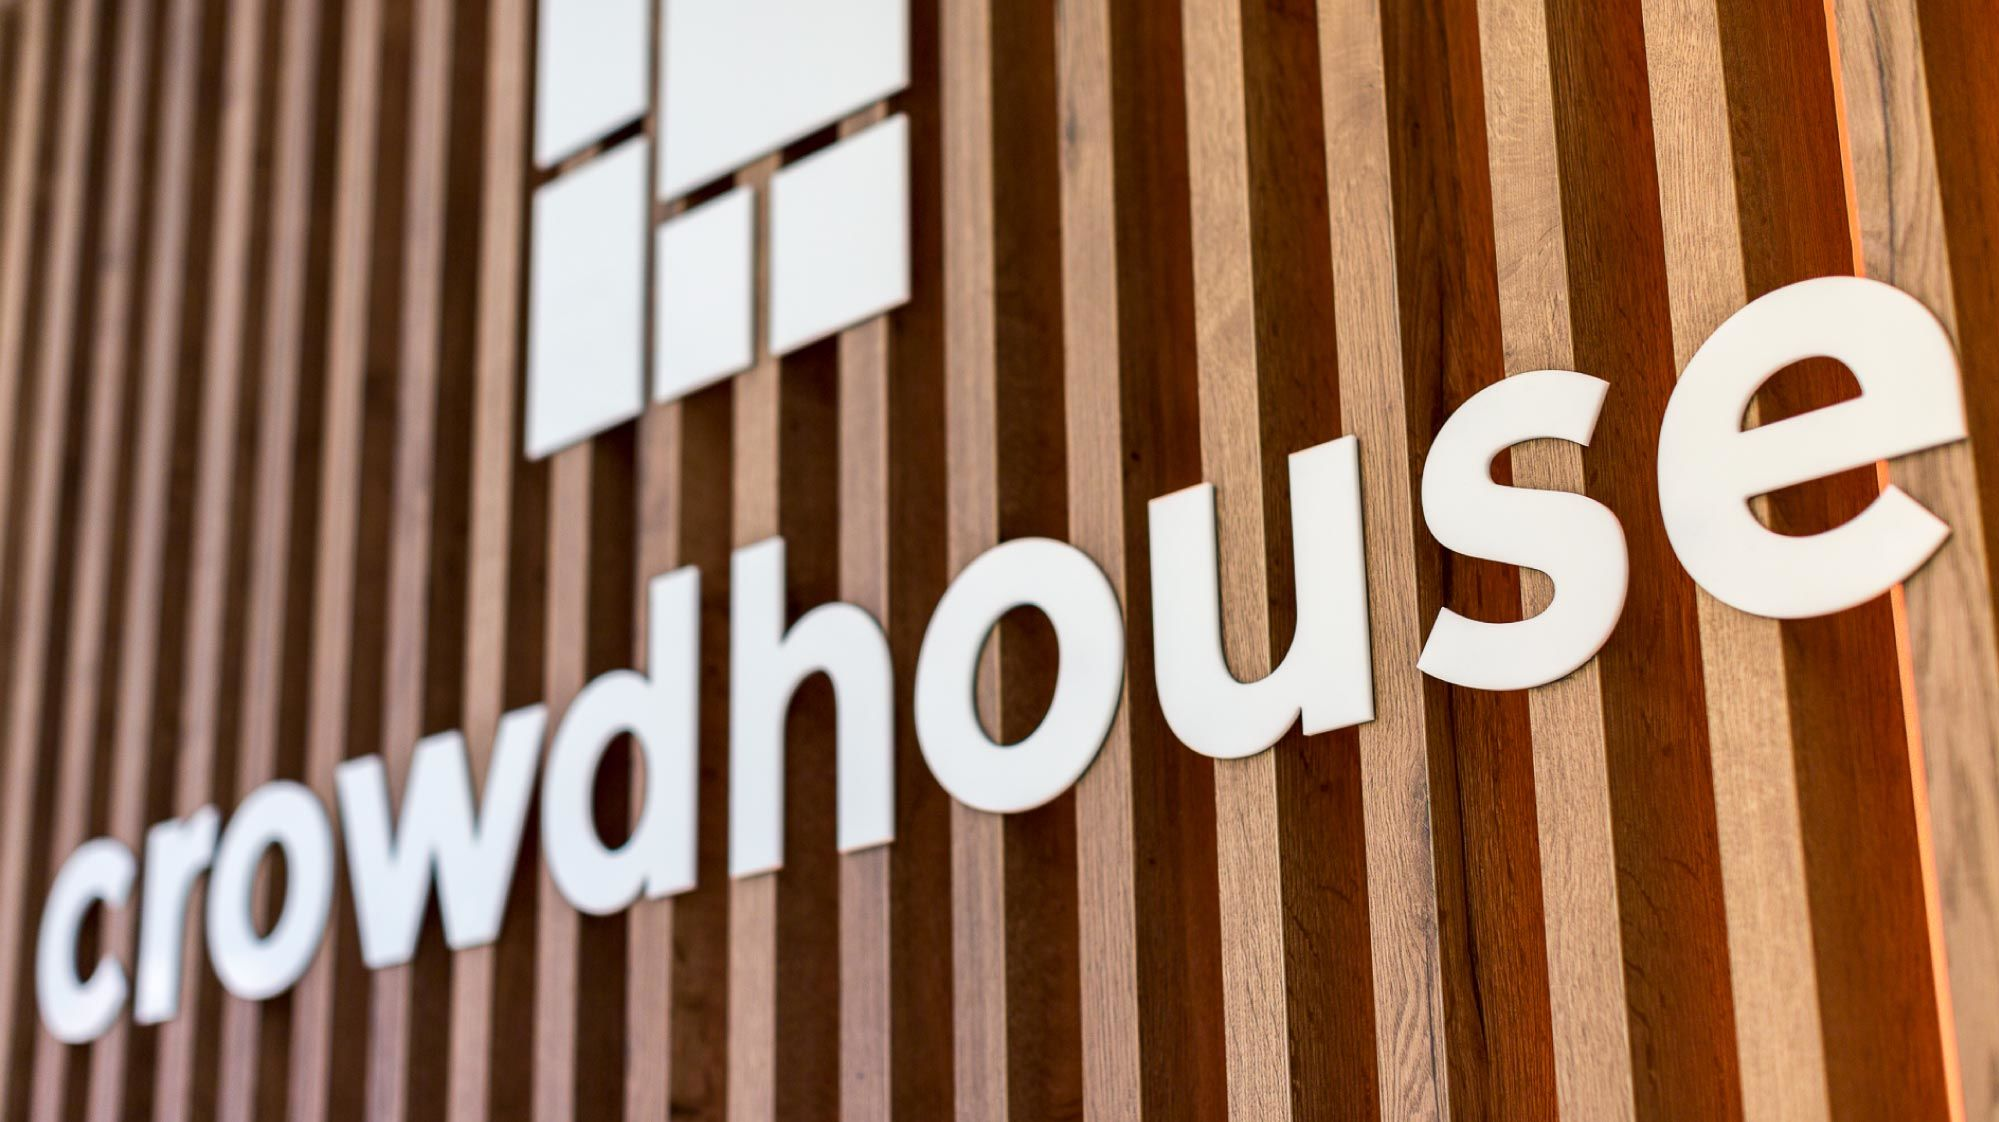 crowdhouse retail